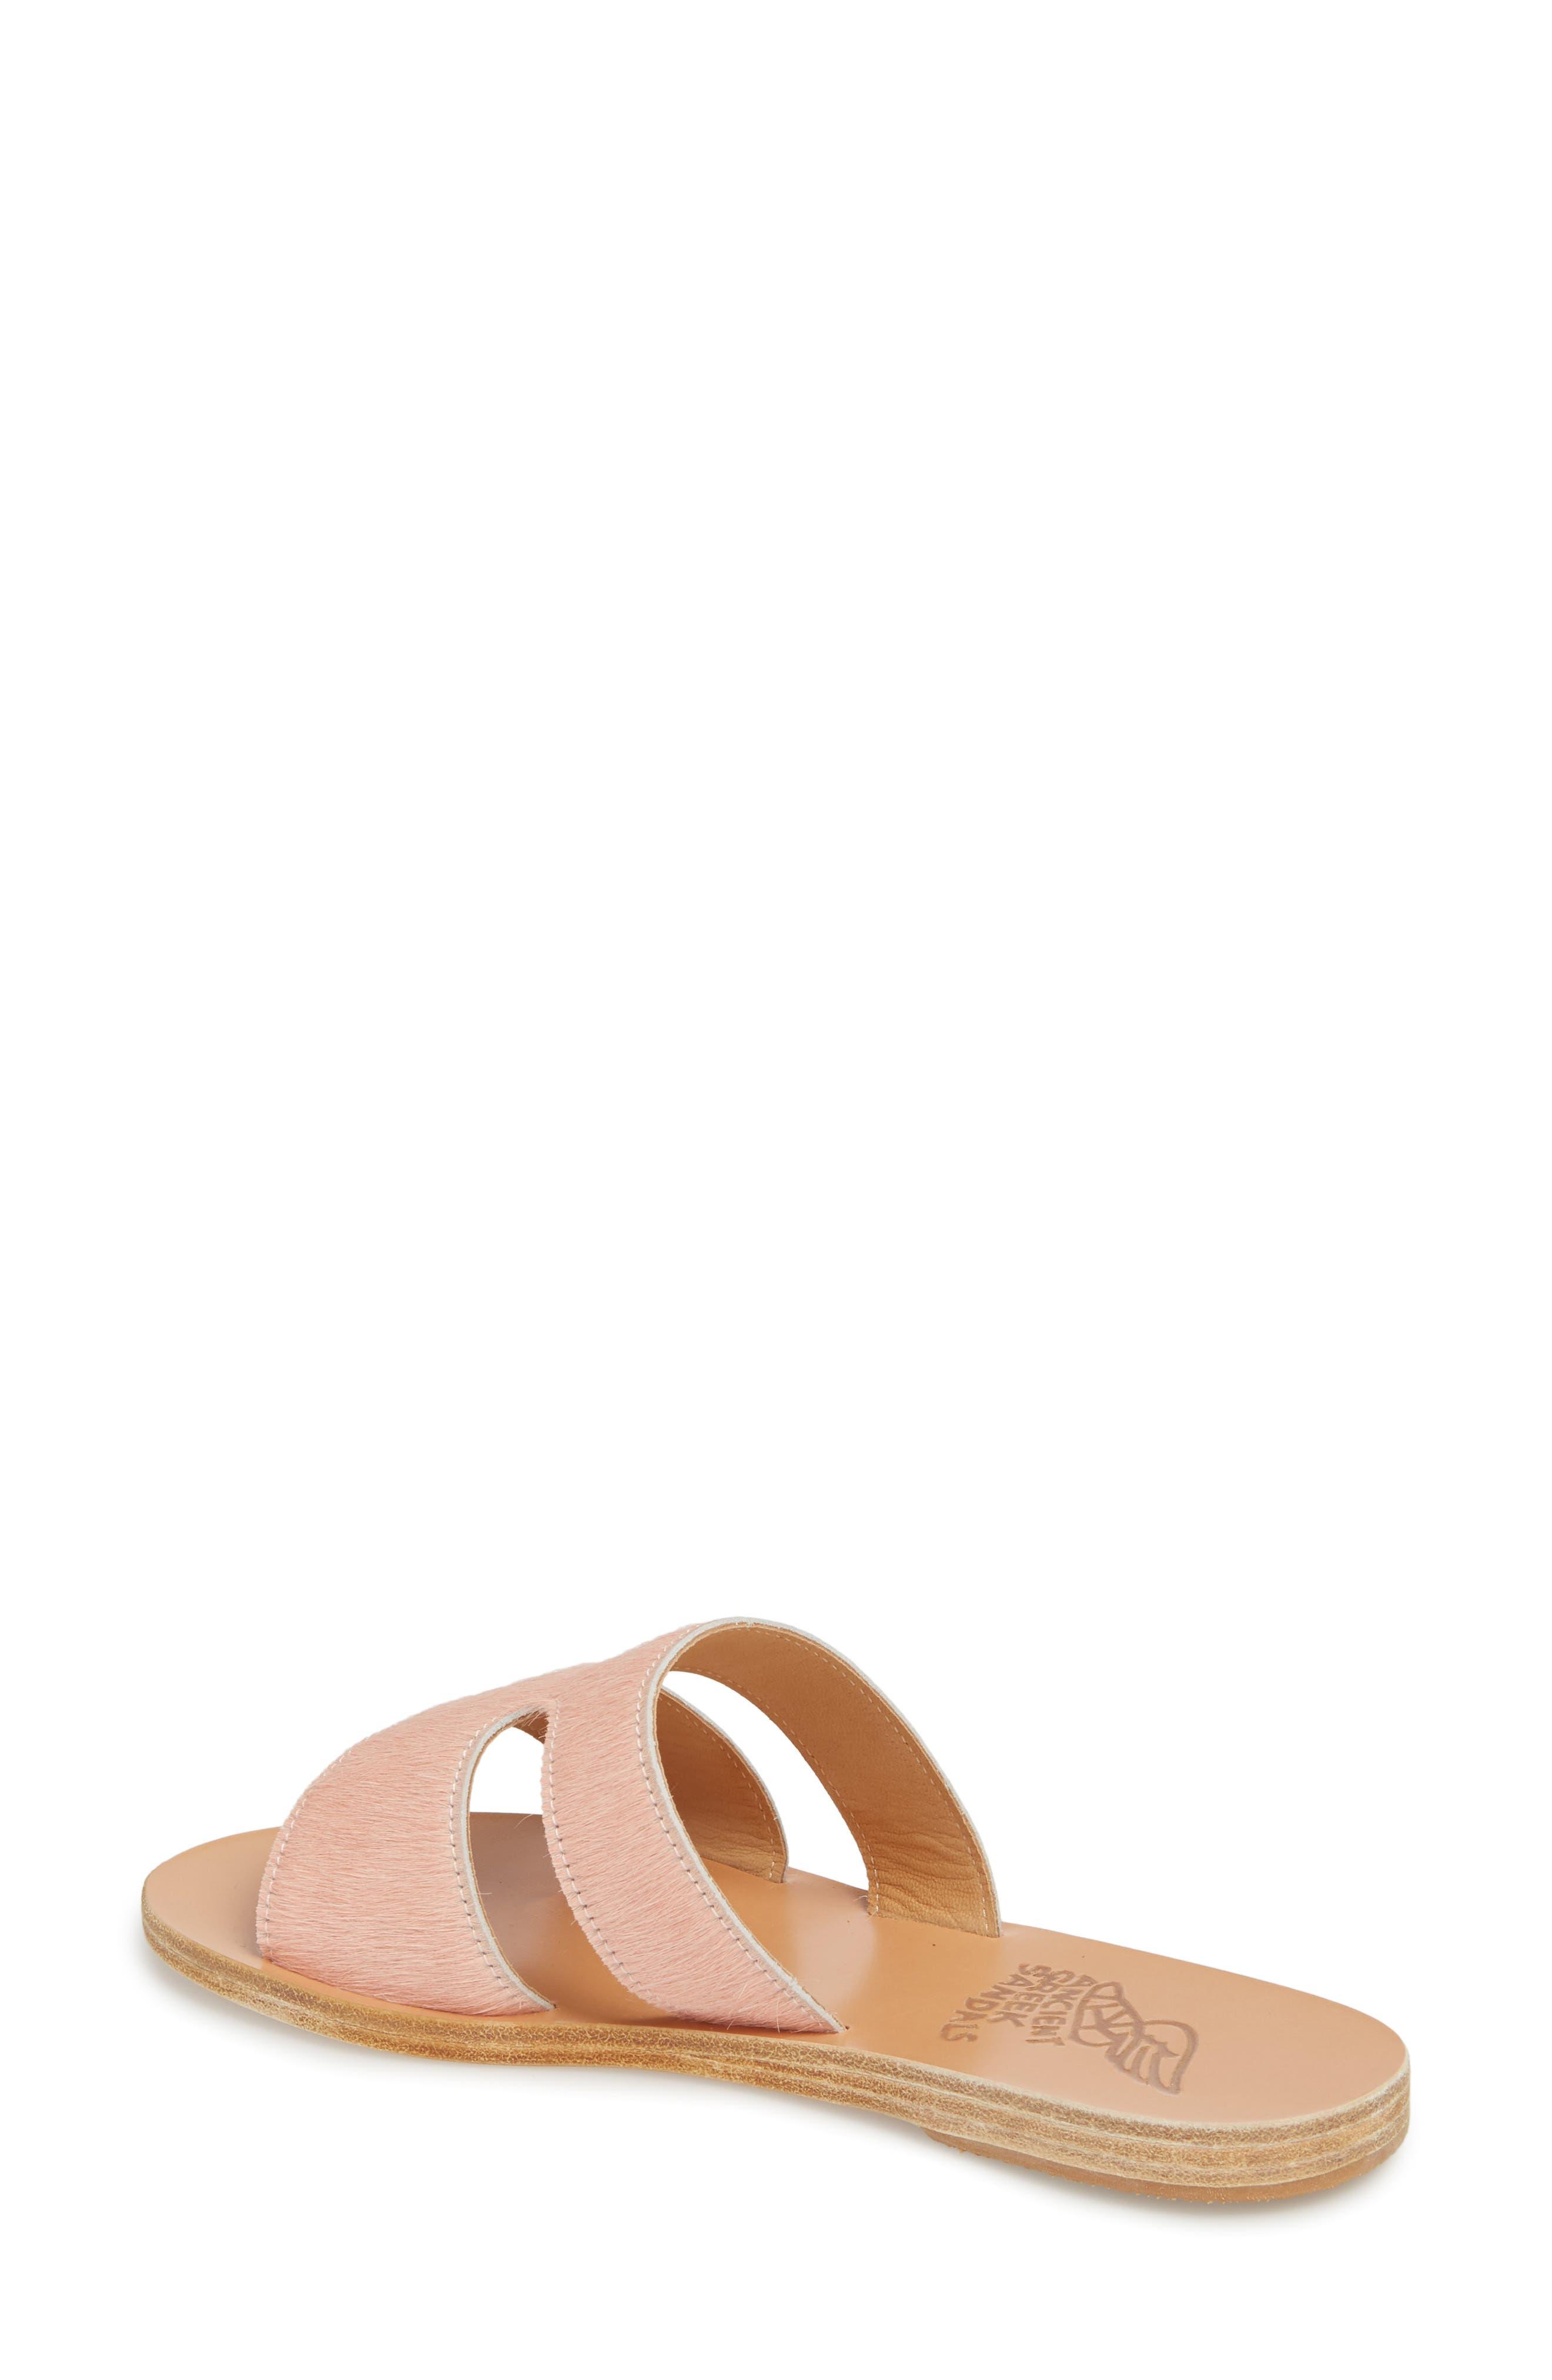 Apteros Genuine Calf Hair Slide Sandal,                             Alternate thumbnail 2, color,                             Pink Pony